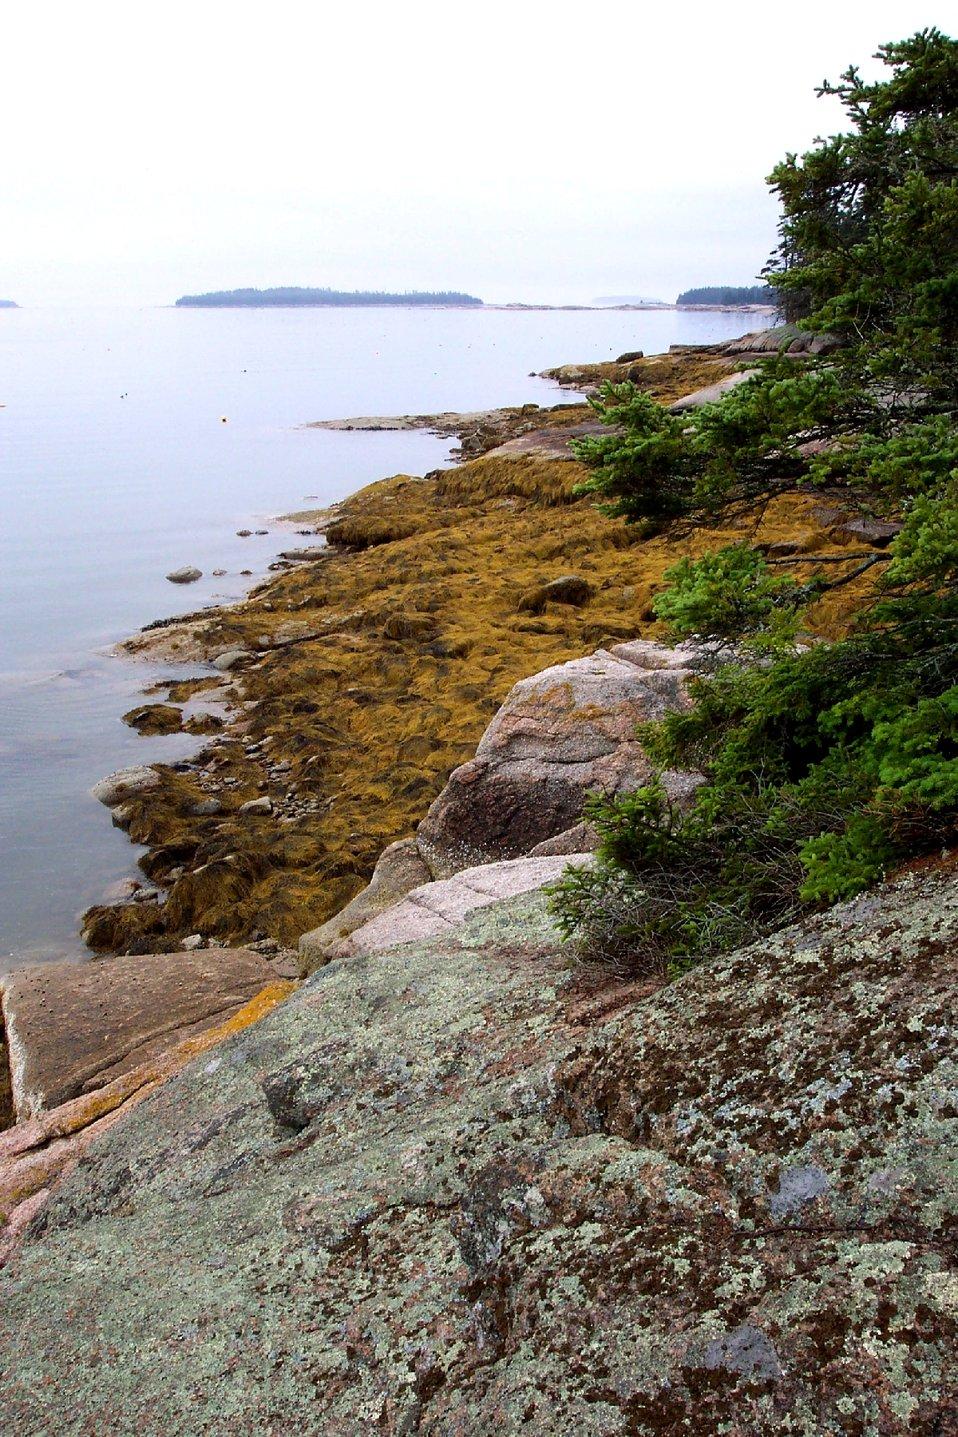 Lichen and conifer covered granite above kelp covered granitic rocks.